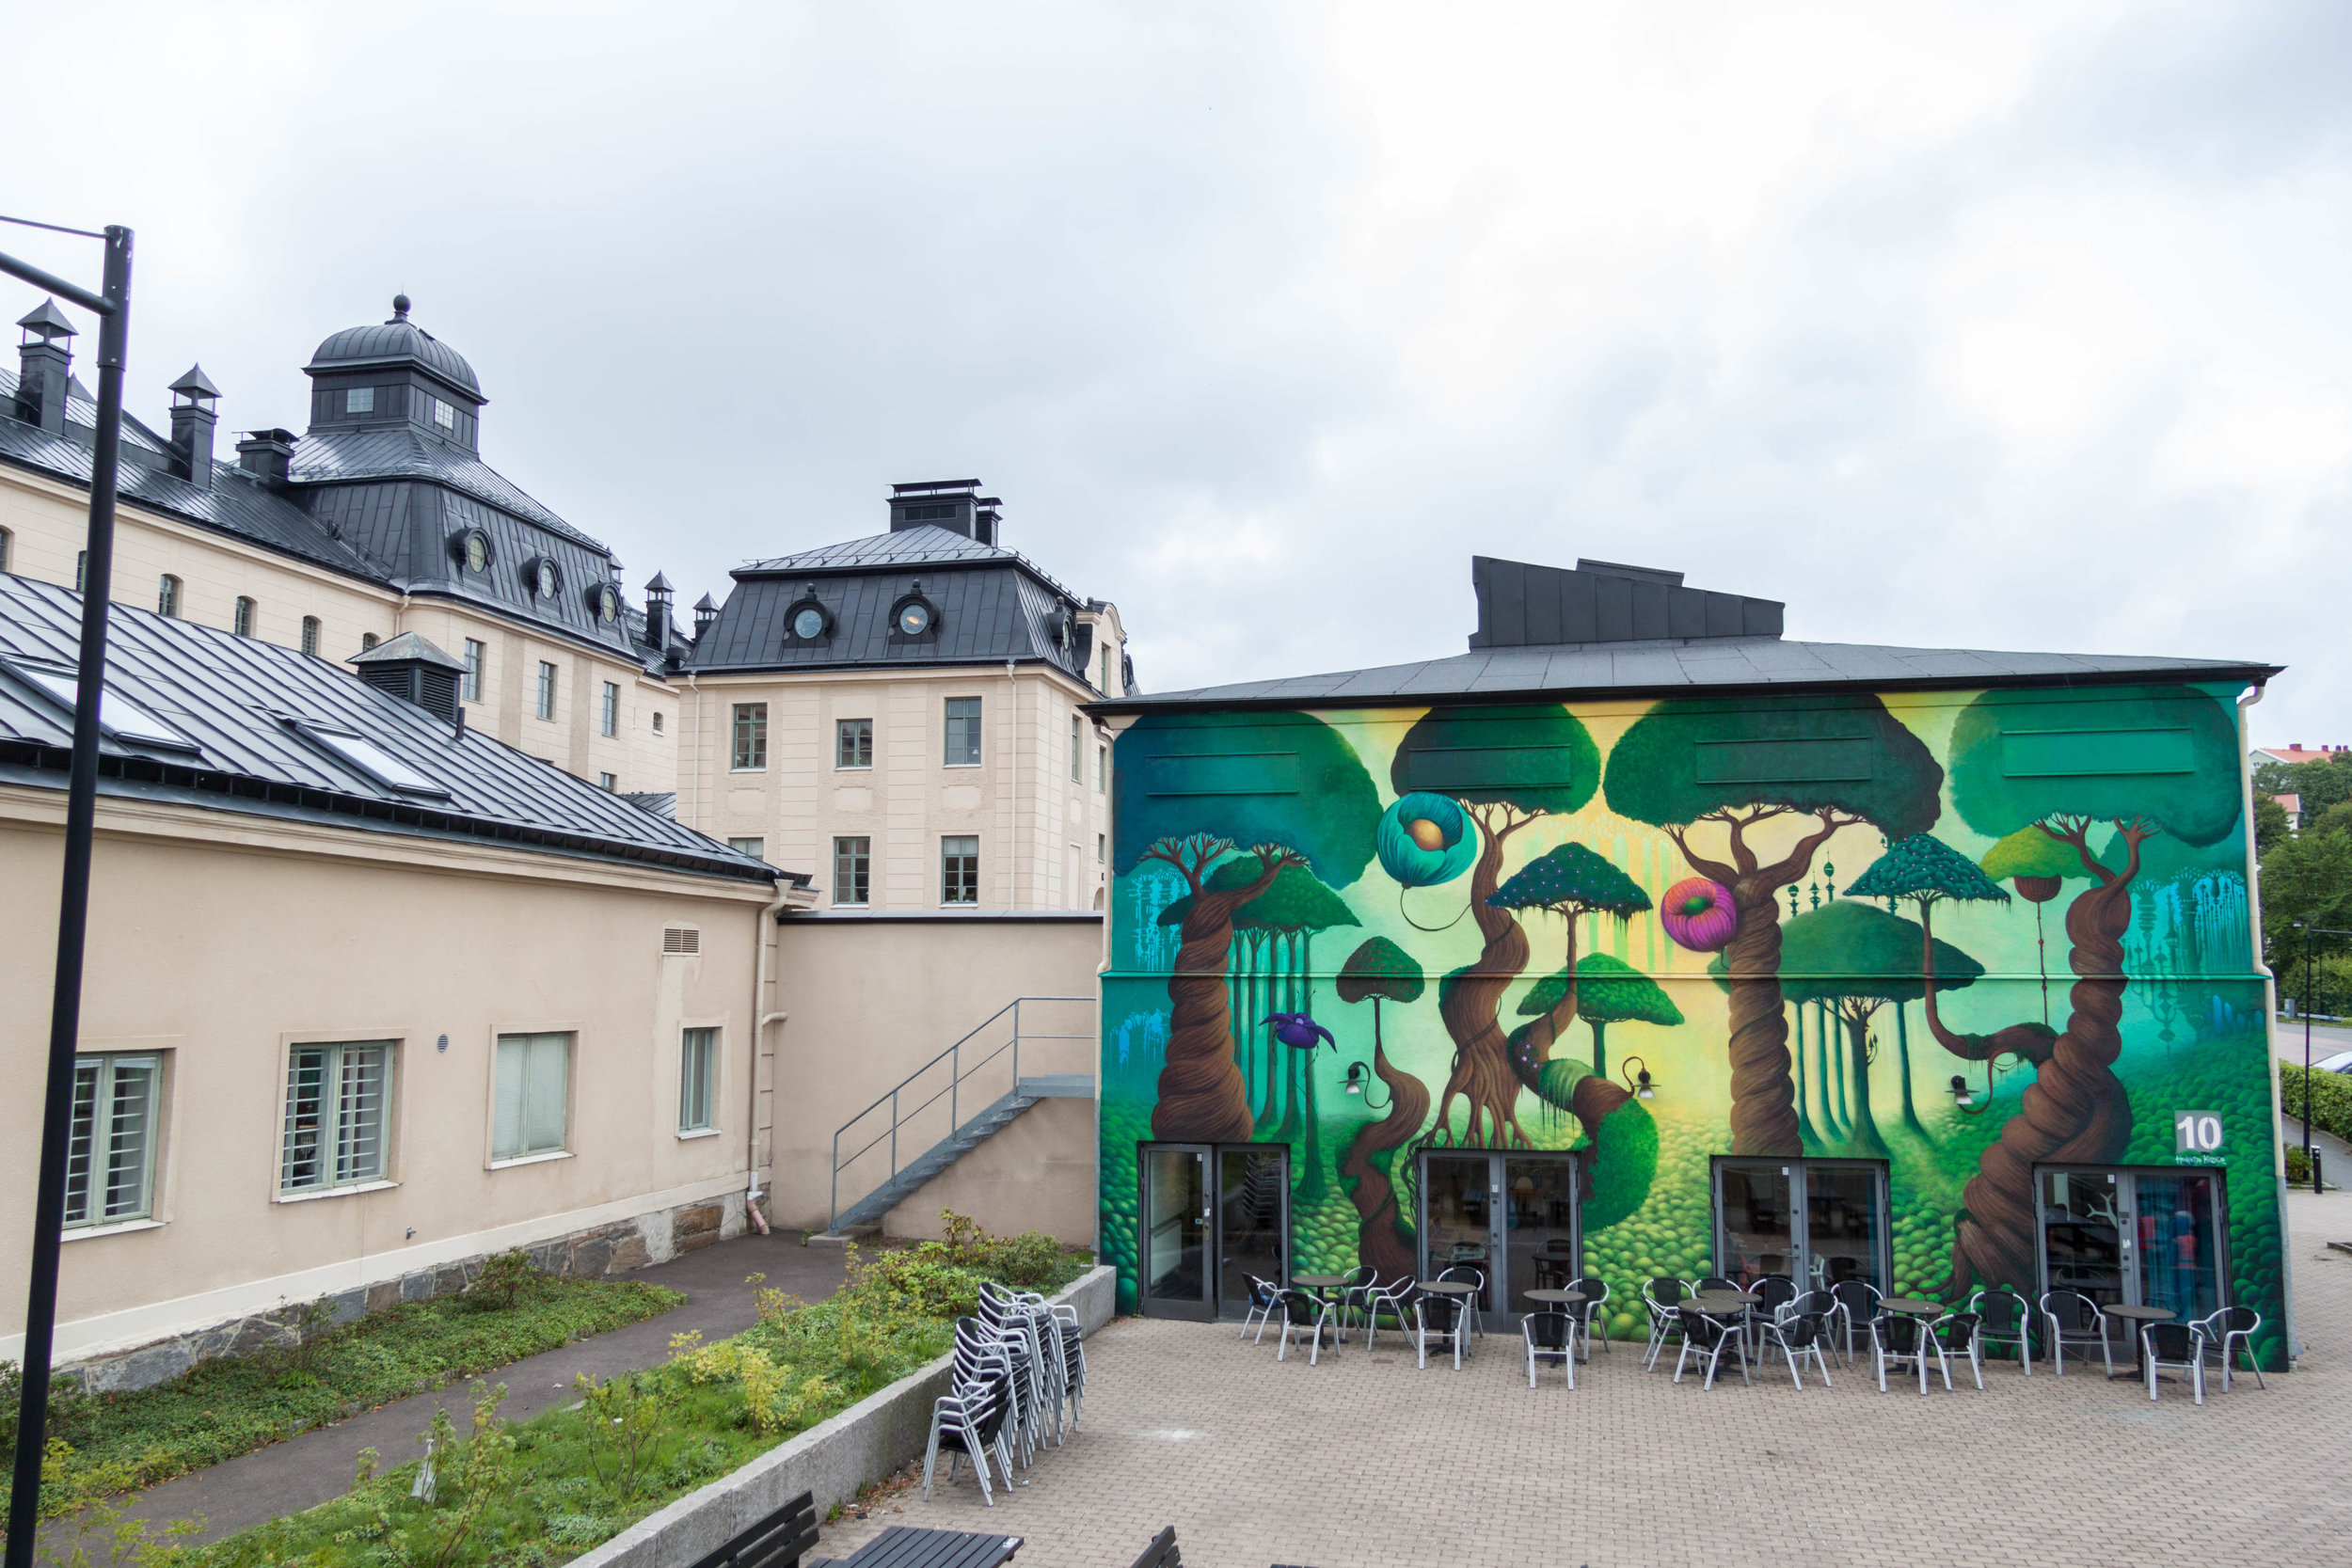 HENRIETTA_Artscape_2016-08-12_FredrikÅkerberg_4690x3127_7.jpg